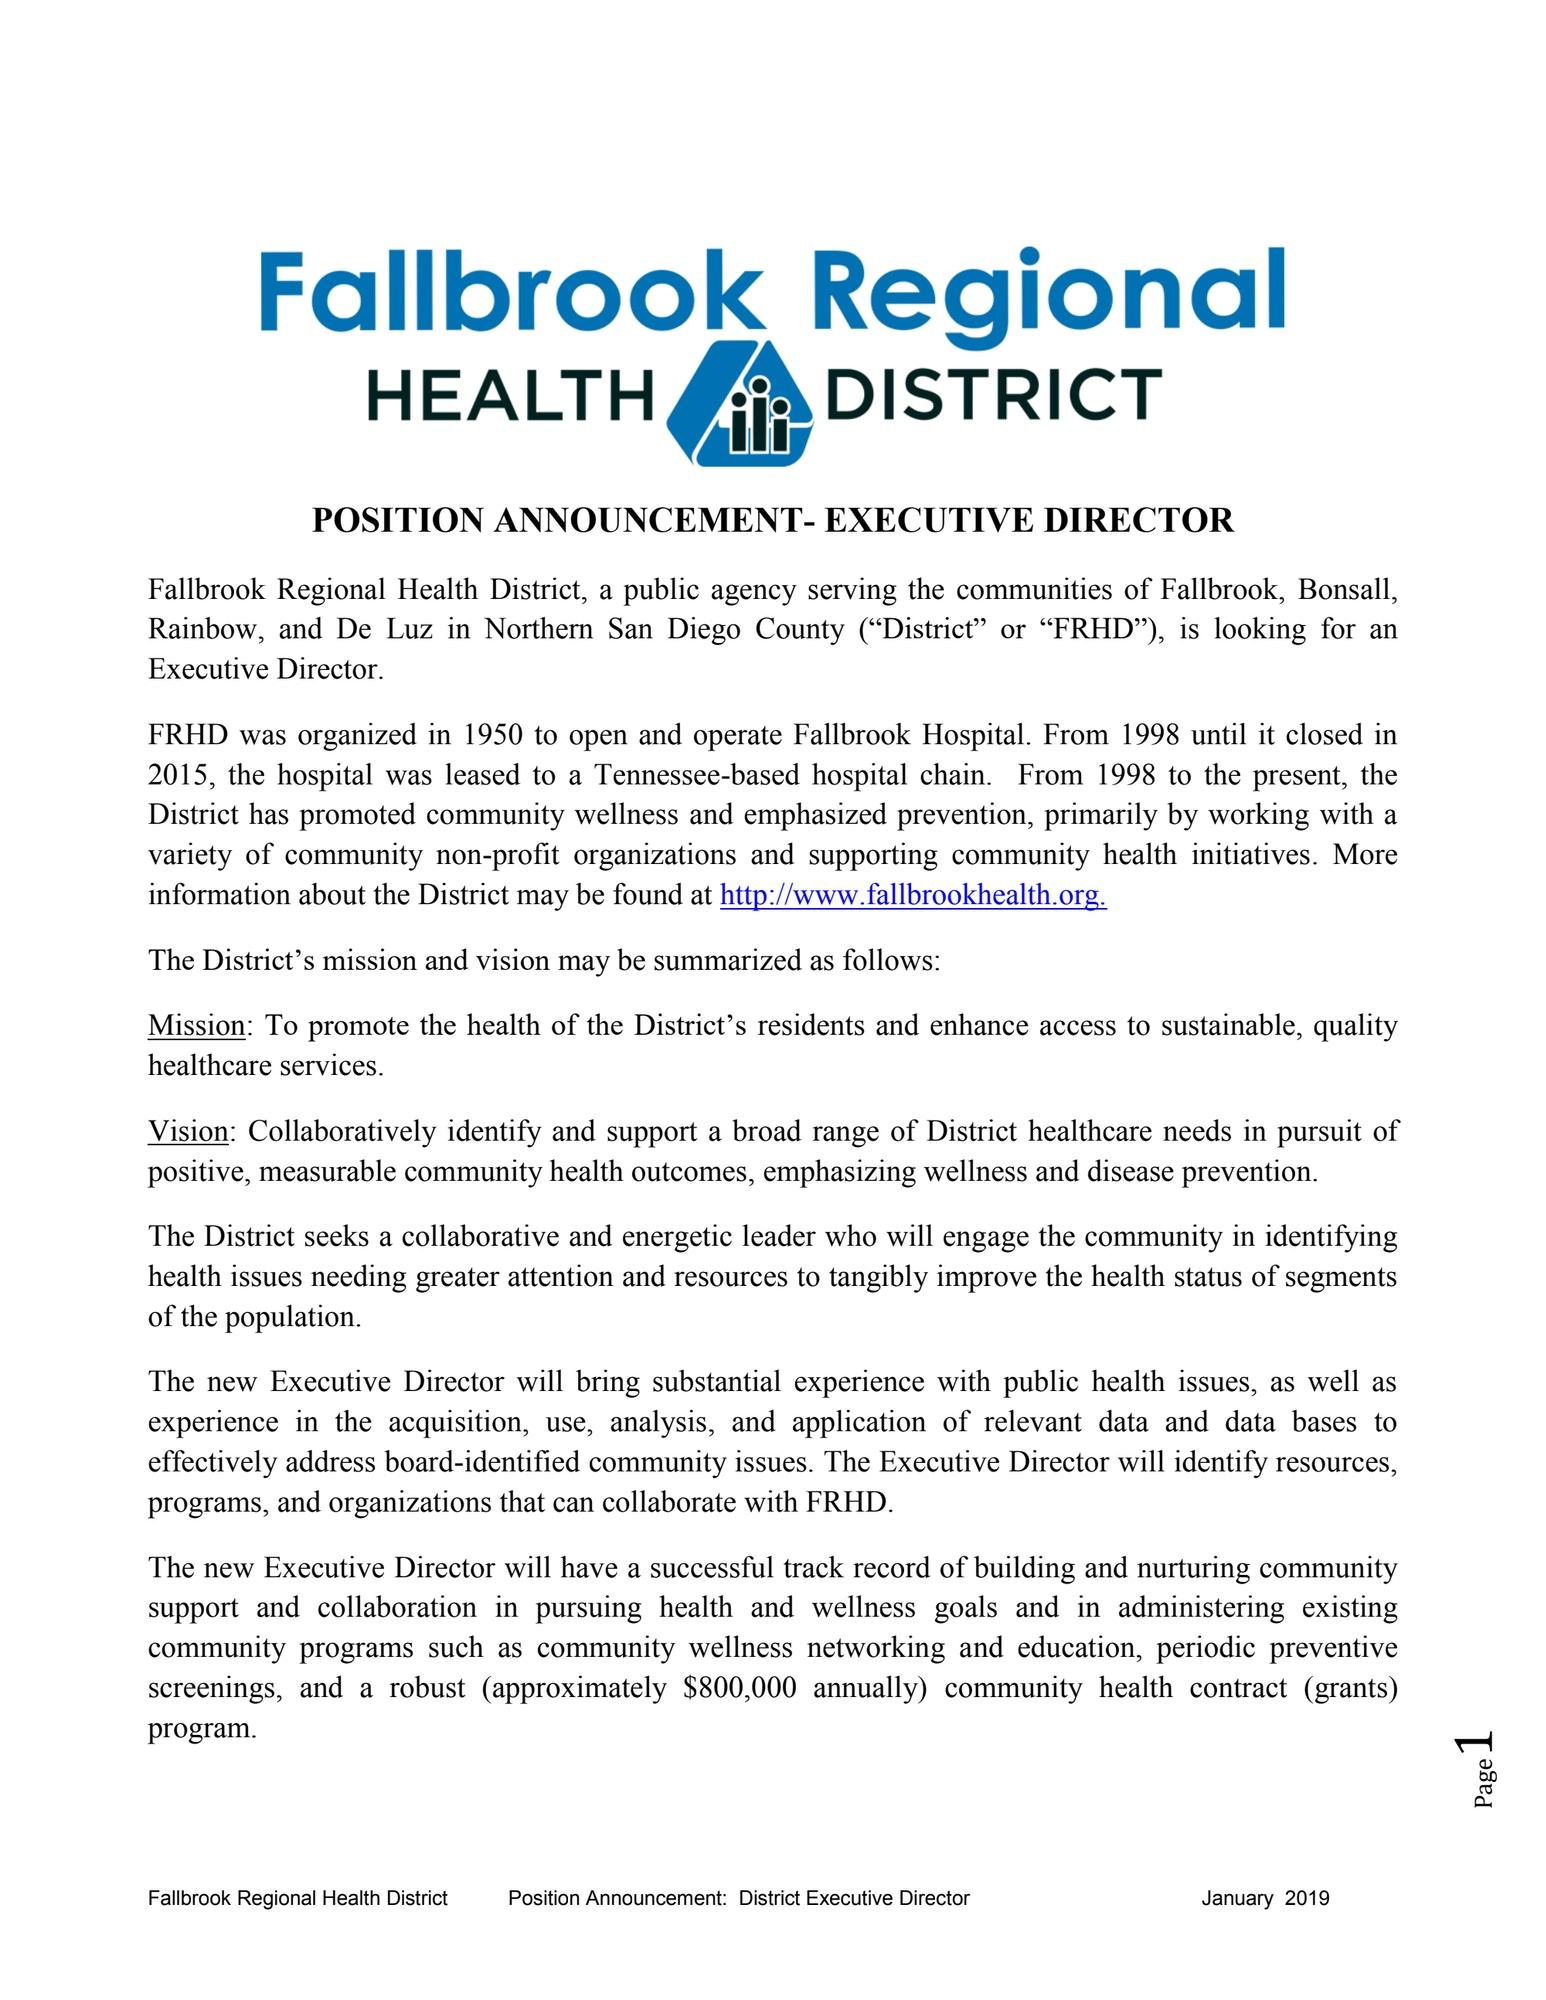 Announcements - Fallbrook Regional Health District